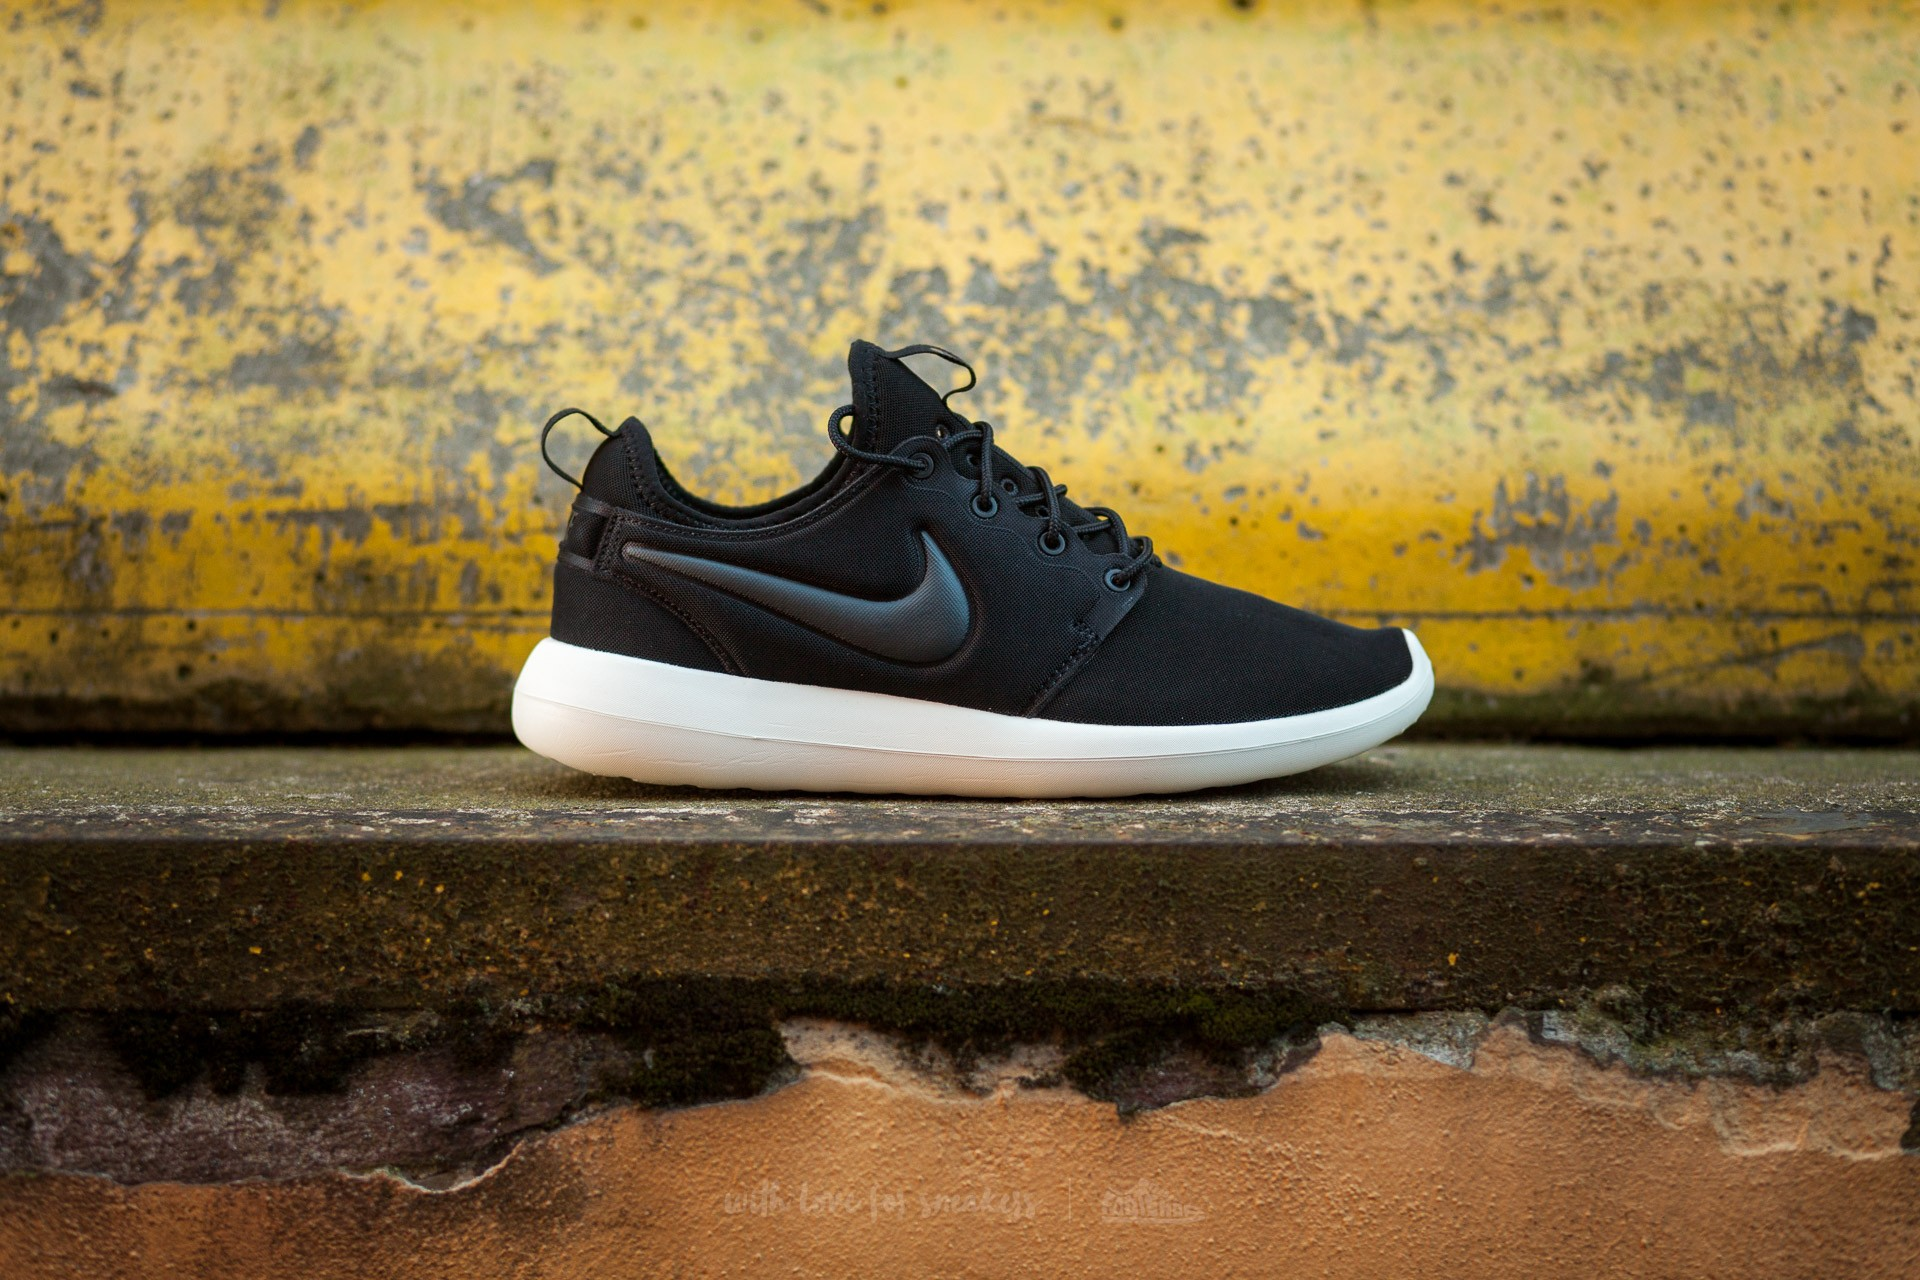 Nike W Roshe Two Black Anthracite Sail Volt | Footshop